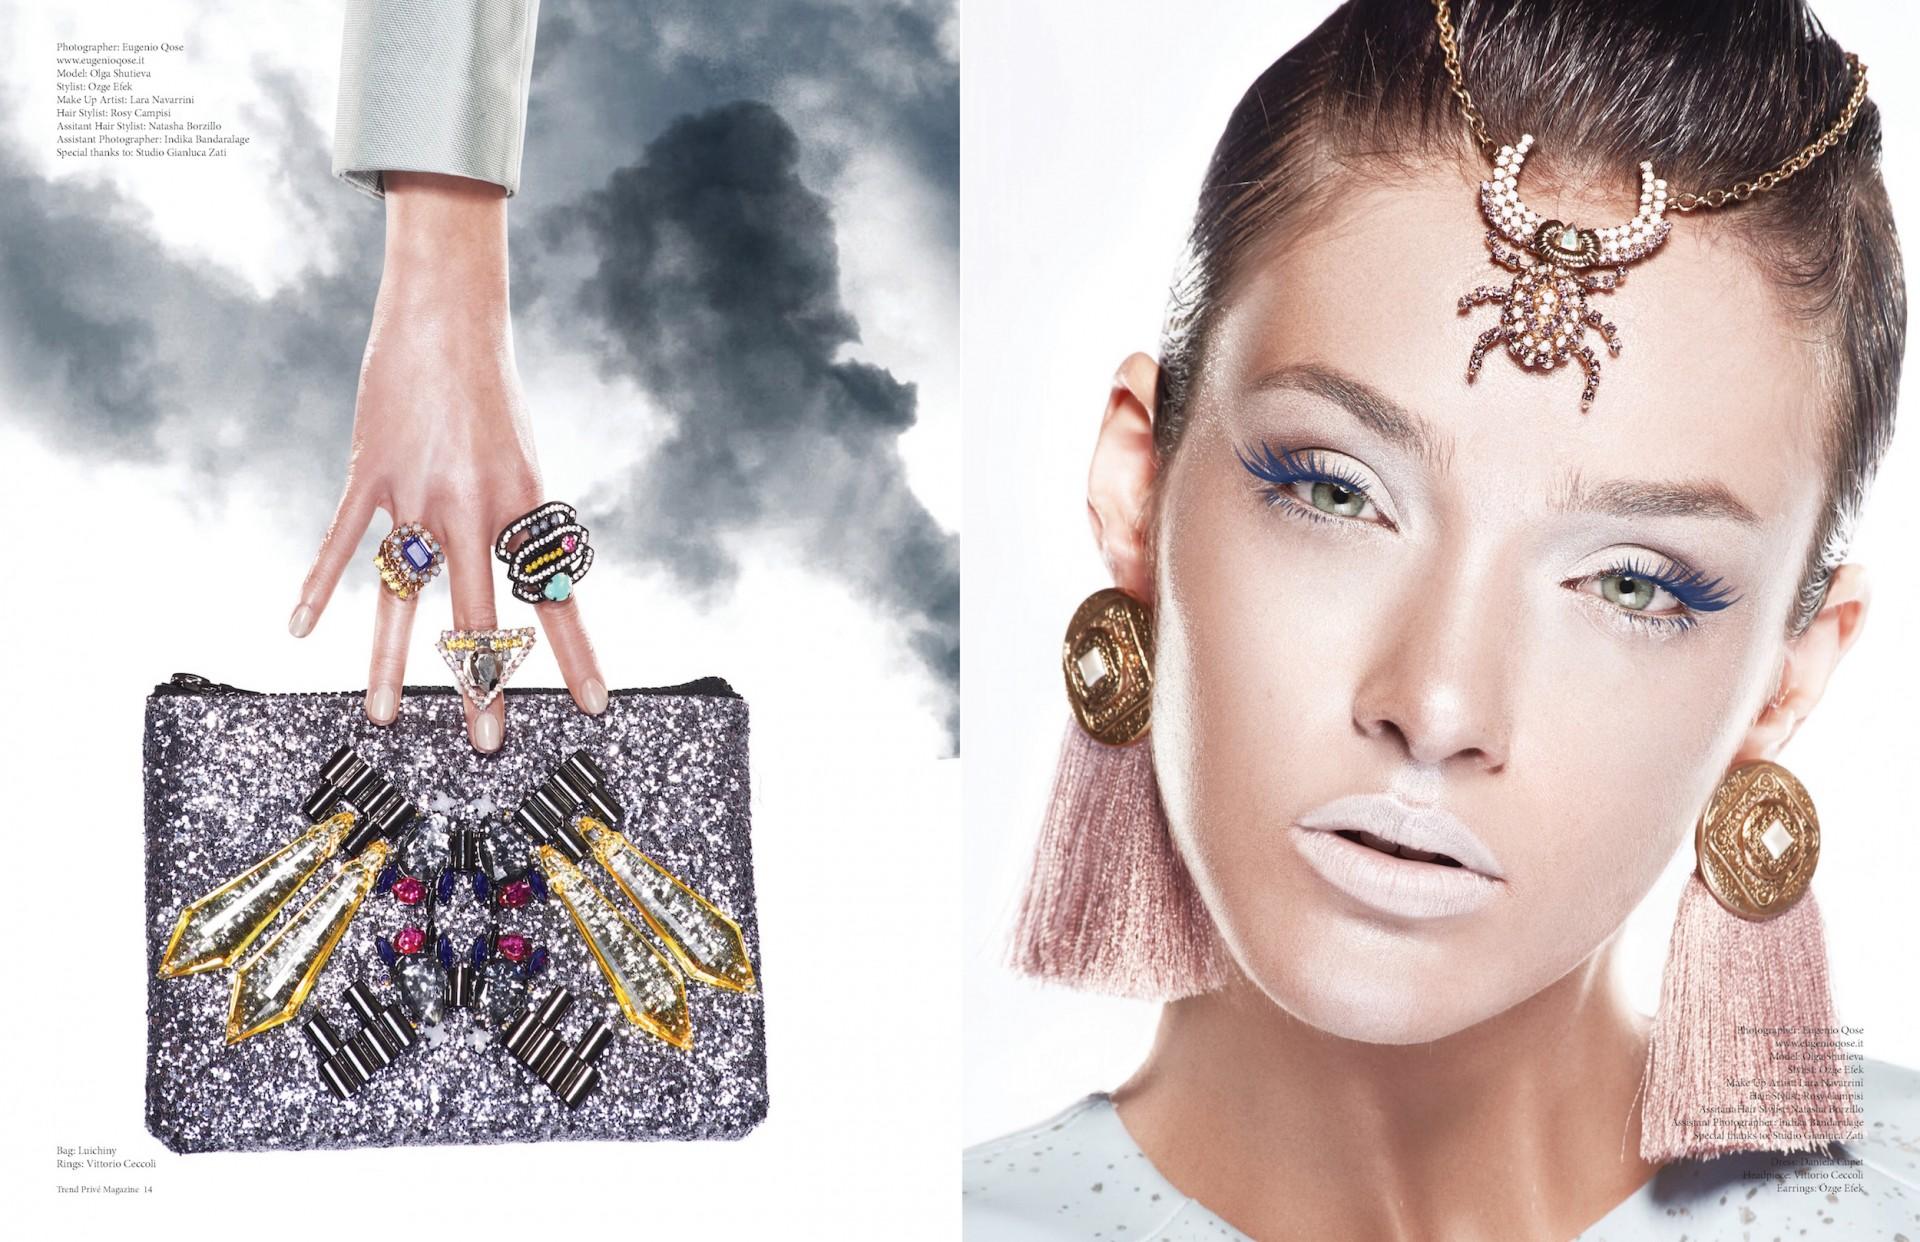 Trend_prive_magazine_eugenio_qose_olga_shutieva_05